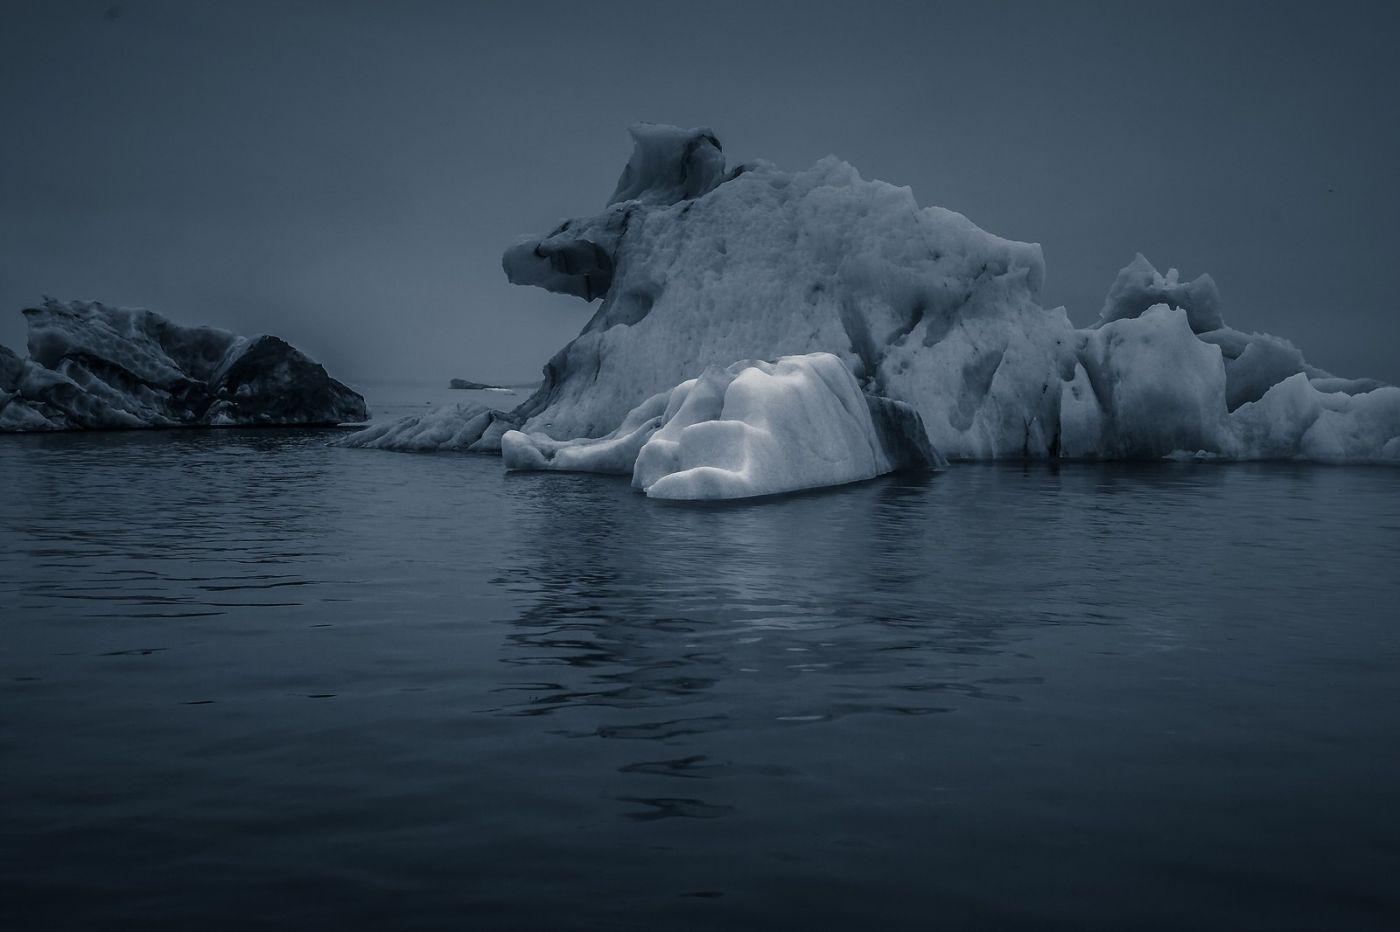 冰岛冰川泻湖(Glacier Lagoon),流动的冰川_图1-5